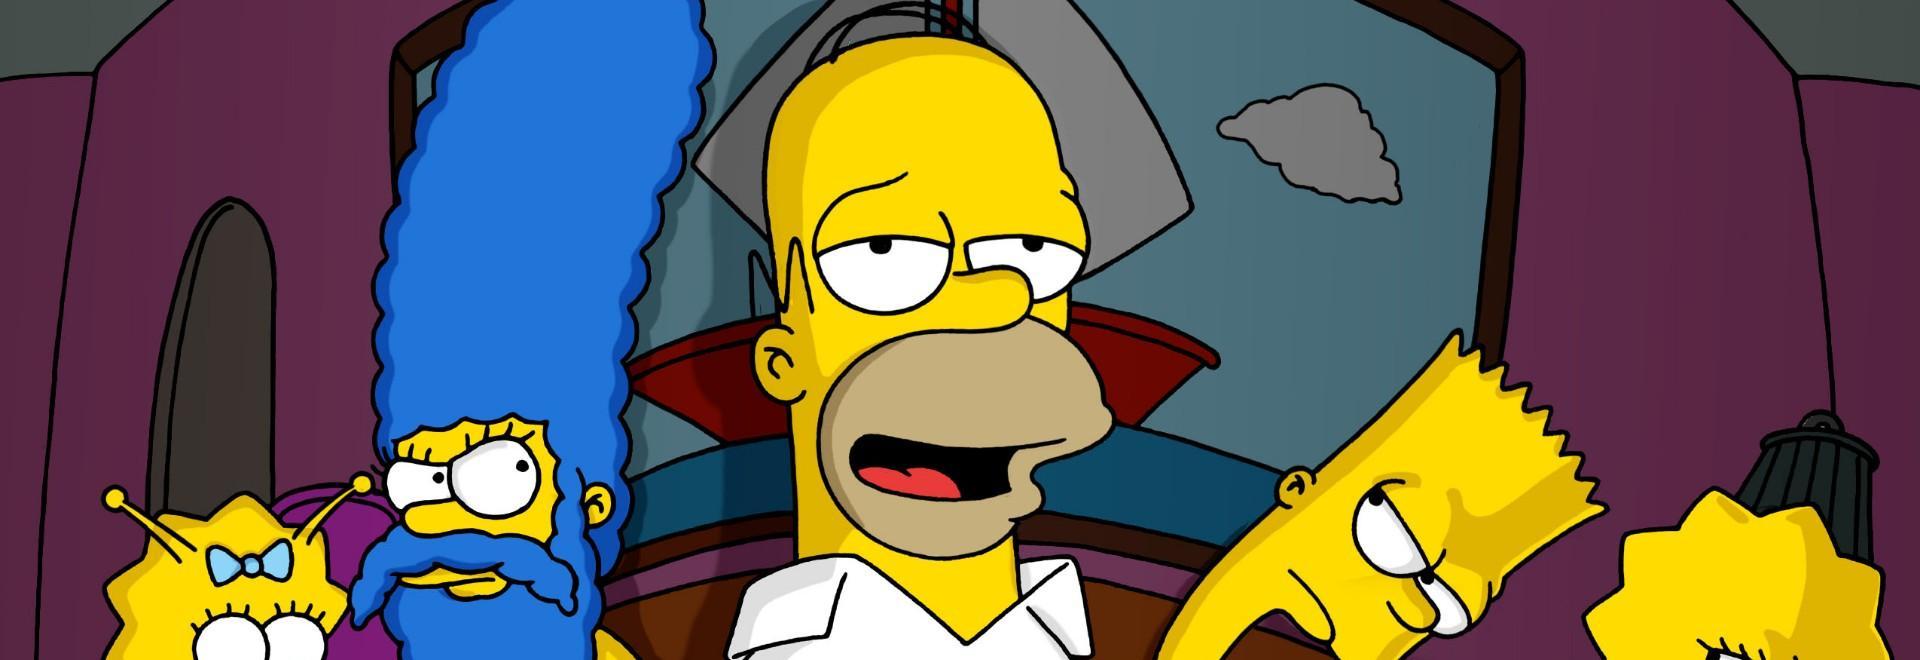 Dolce e amara Marge